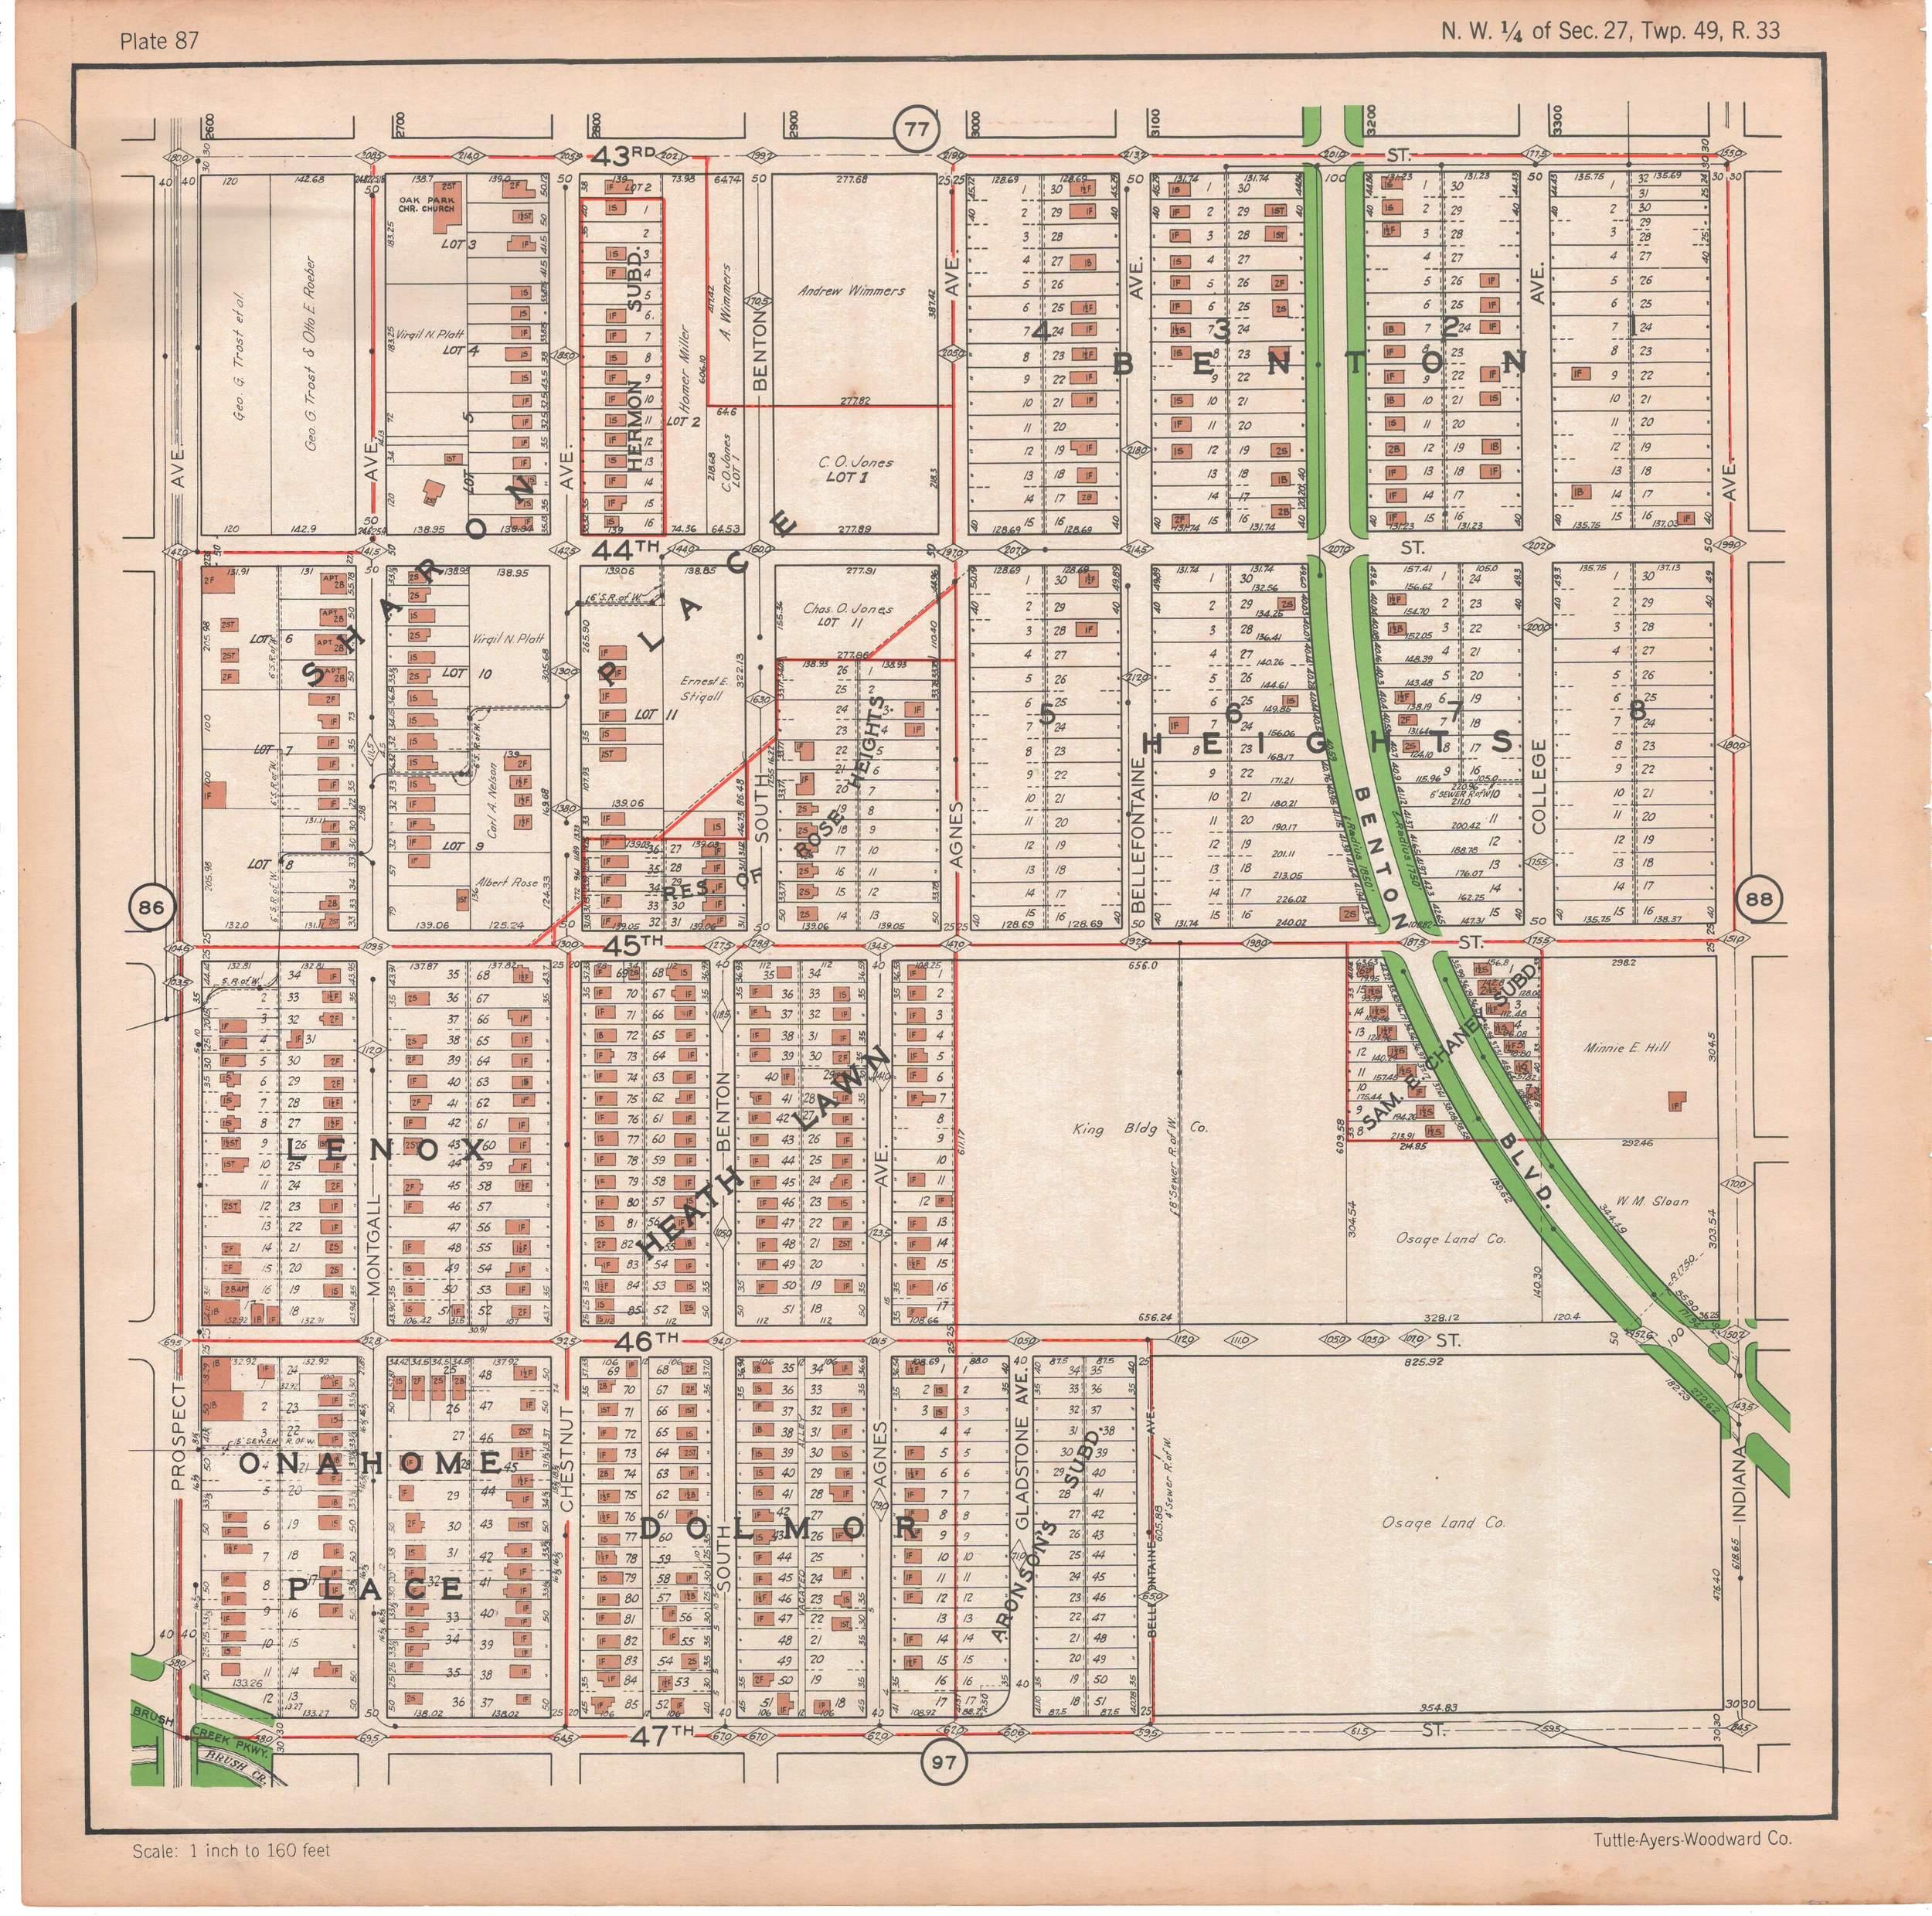 1925 TUTTLE_AYERS_Plate 87.JPG